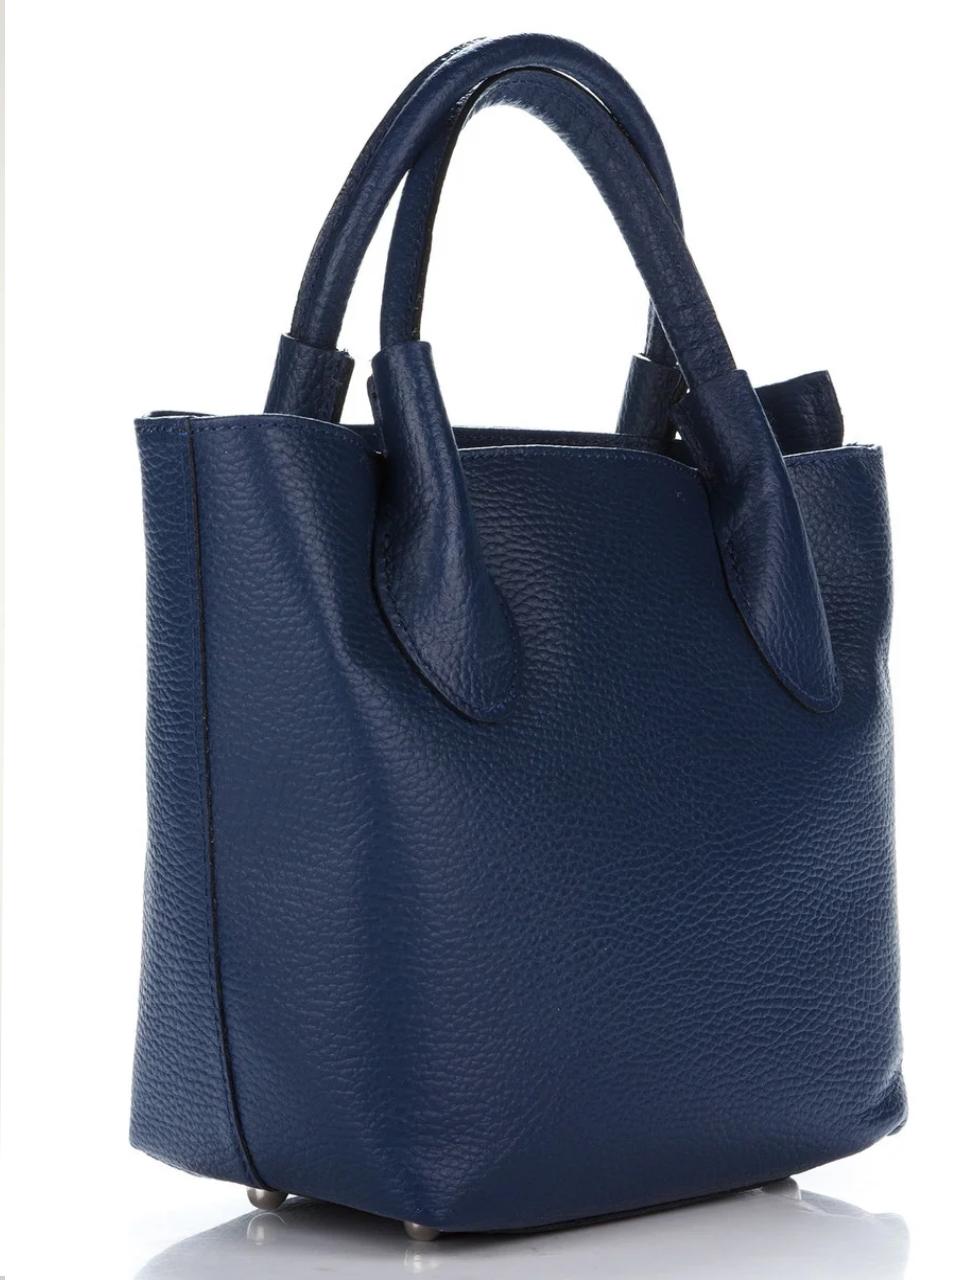 Женская итальянская натуральная кожаная сумка синяя 25х22х12